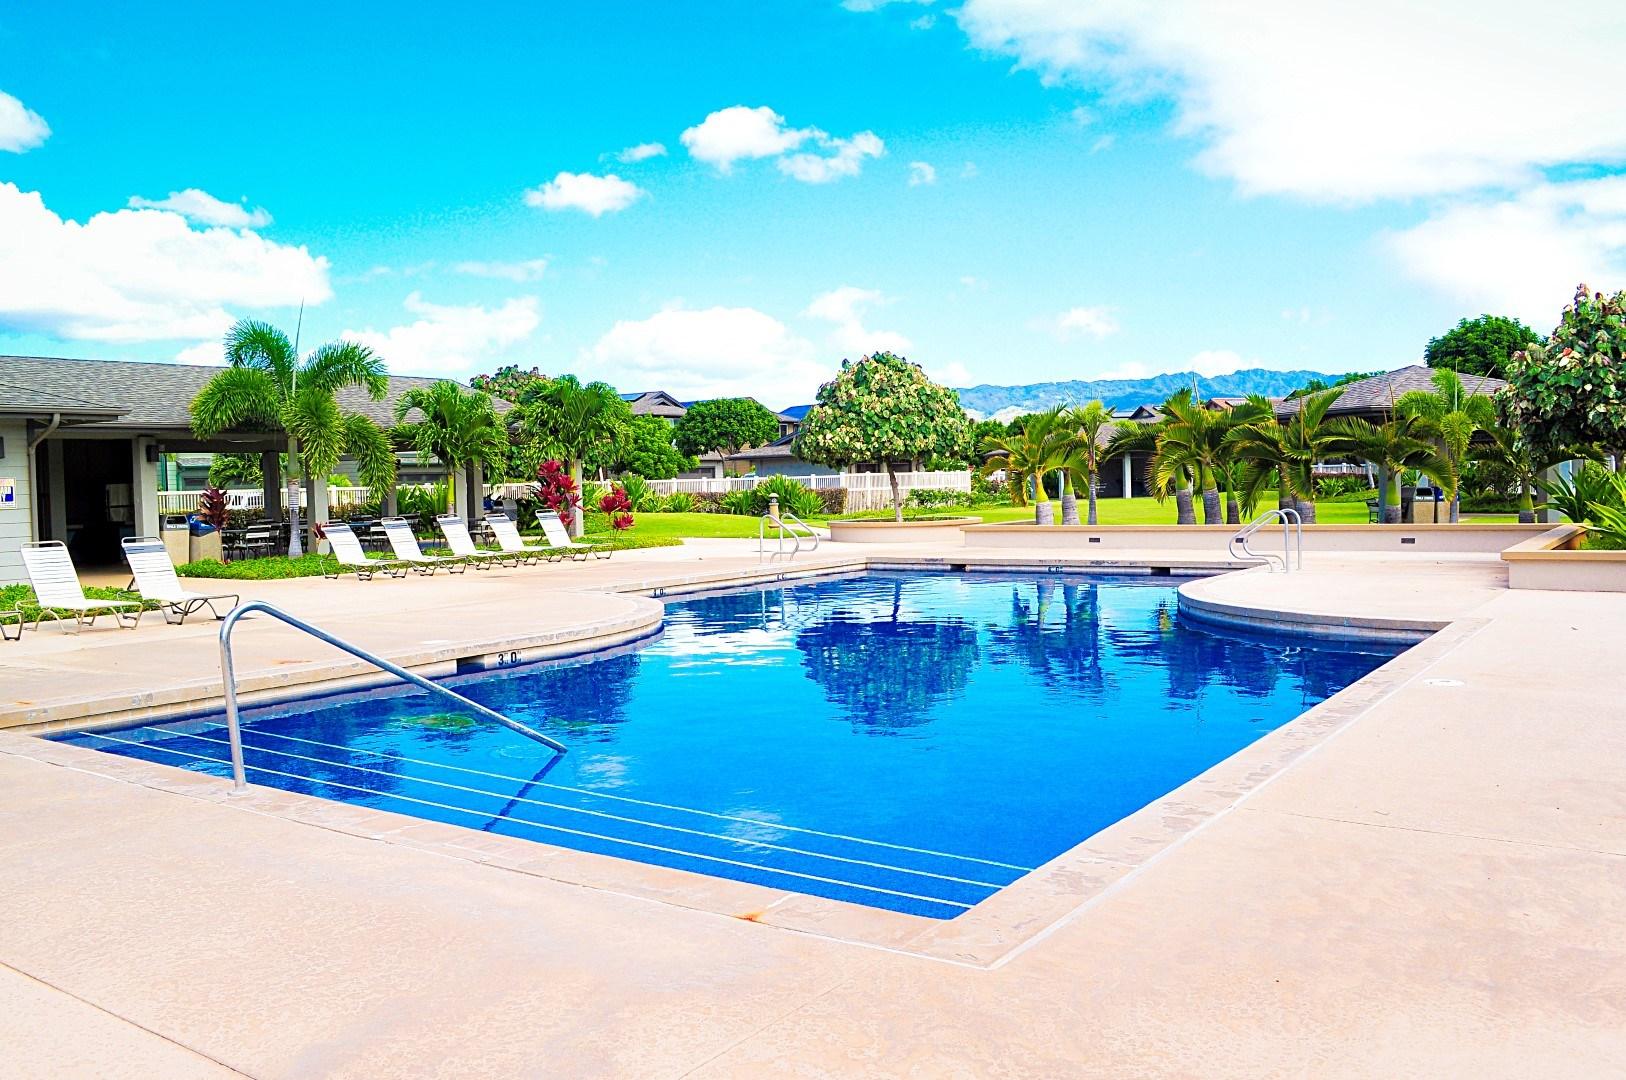 New Listing In Ewa By Gentry Laulani Trades Hawaii Real